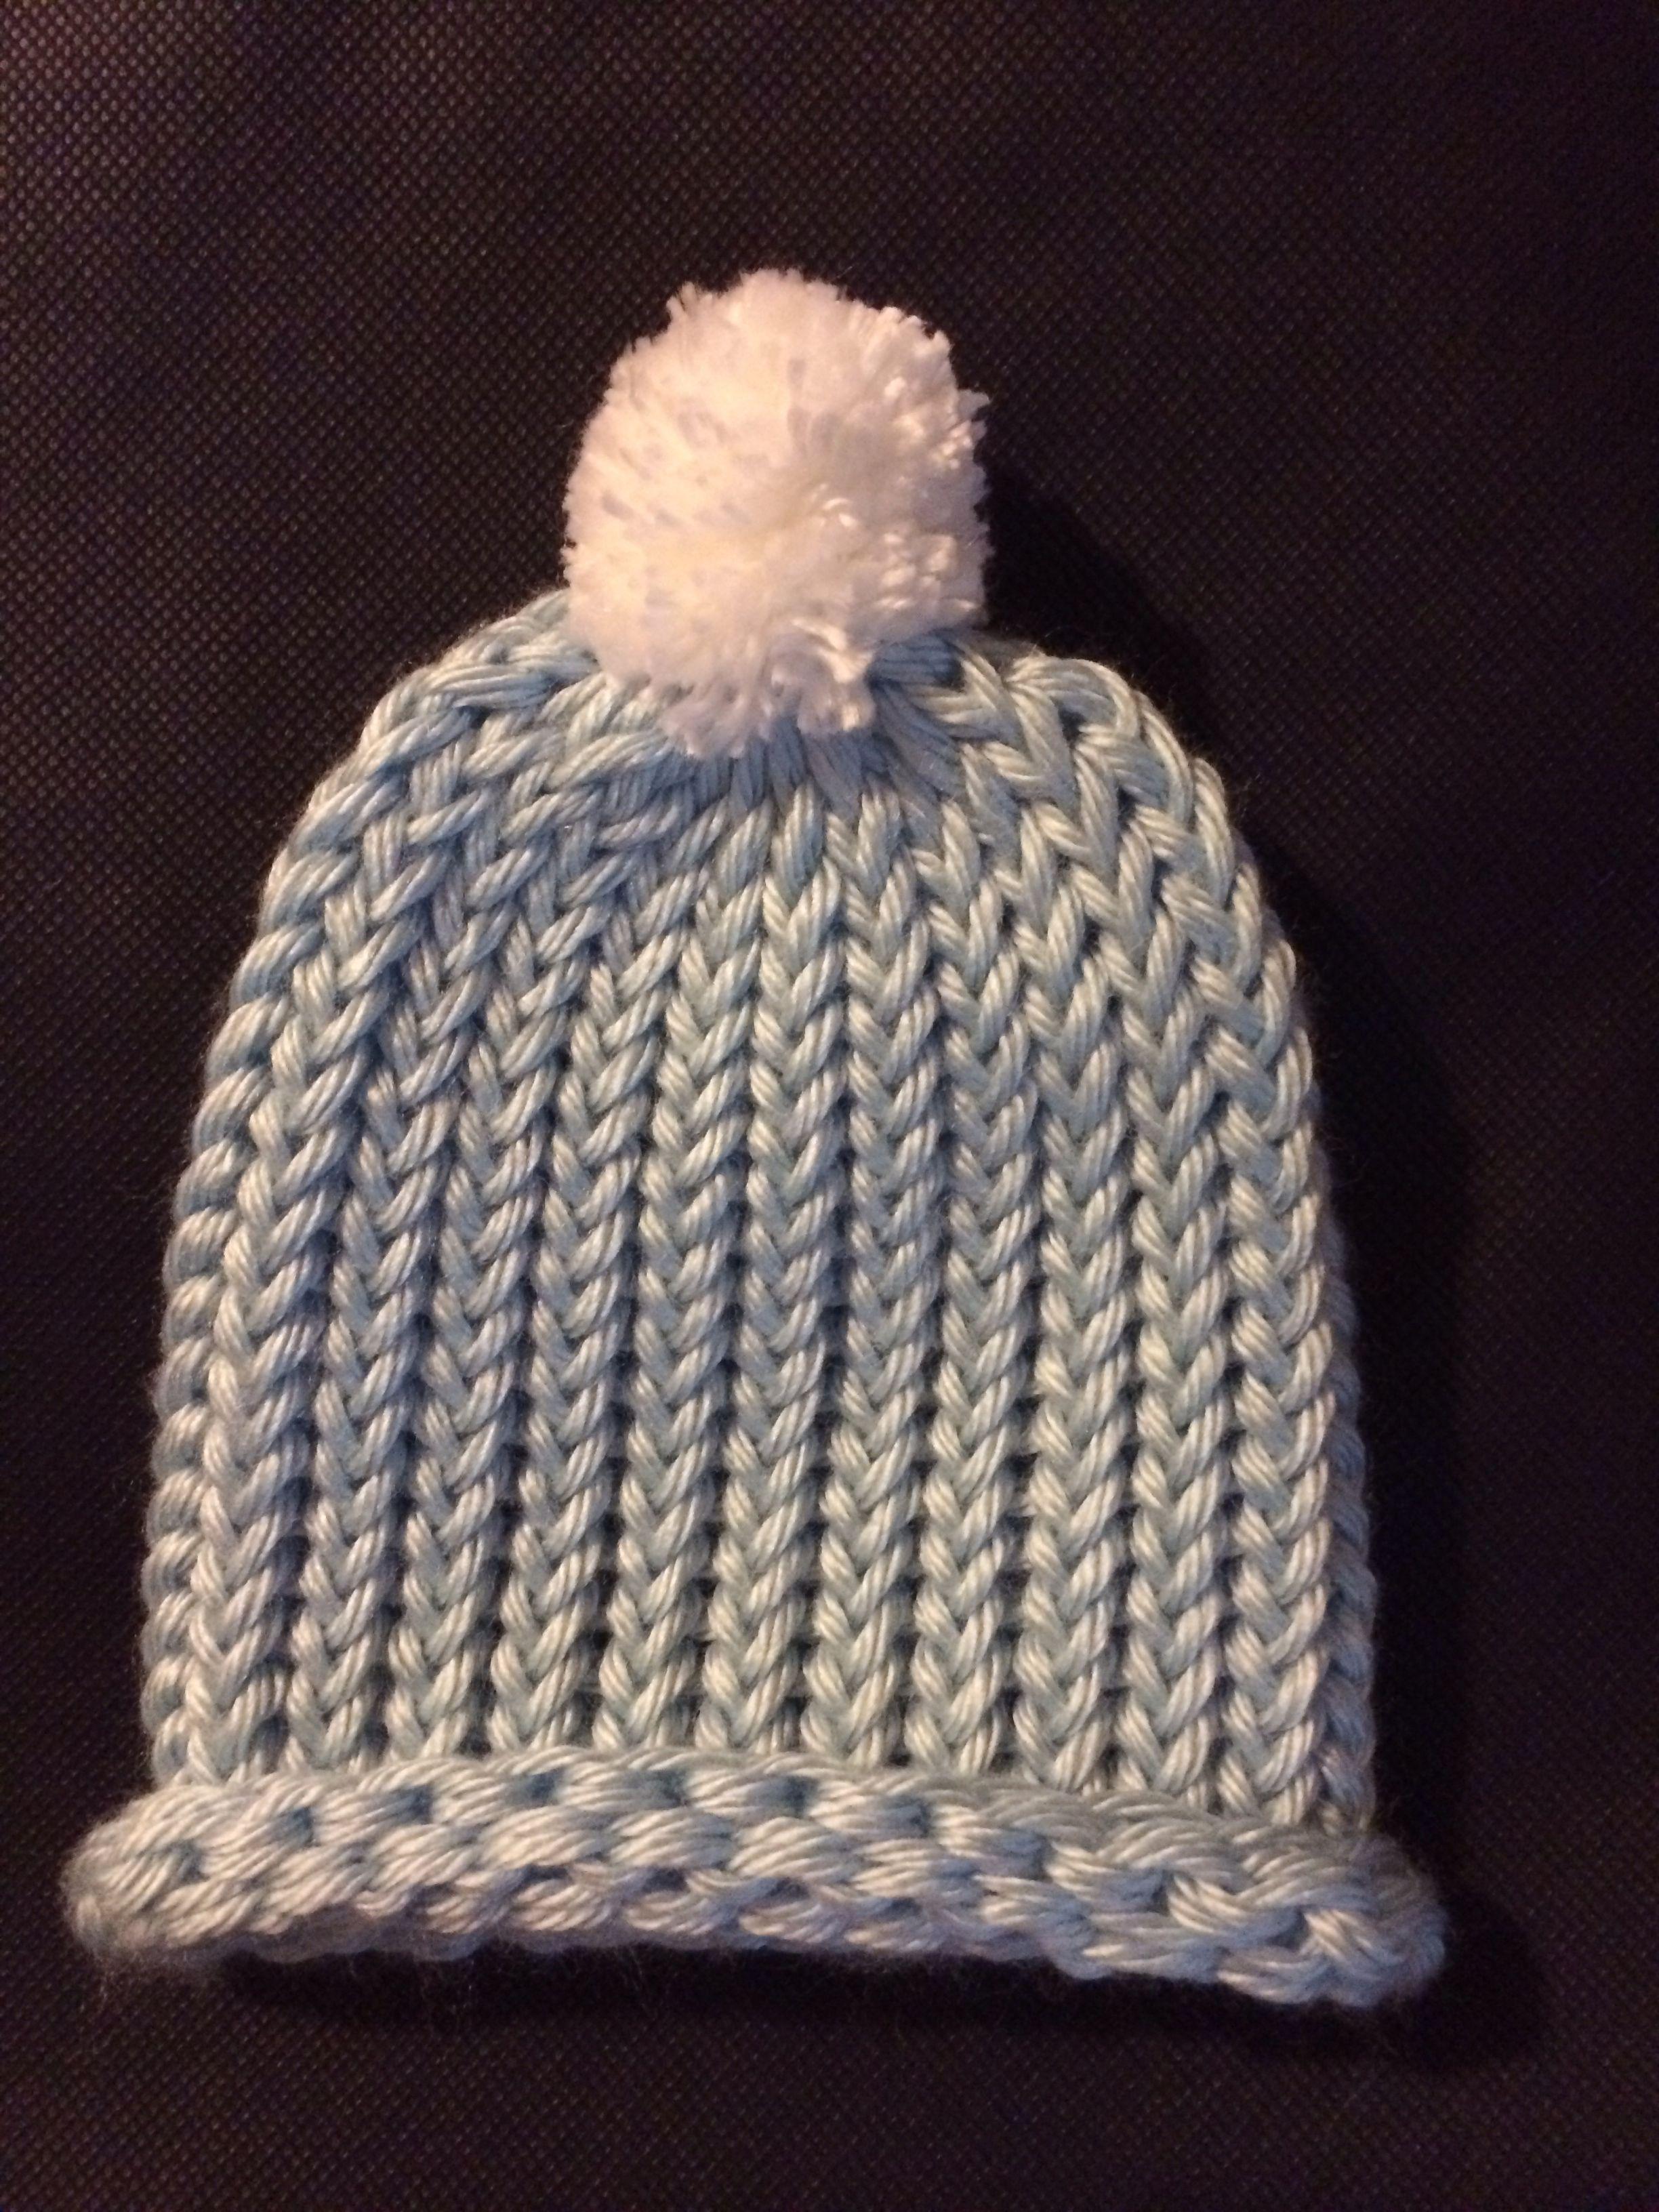 Loom Knitting Project: Baby Boy Hat | Loom knitting, Loom ...